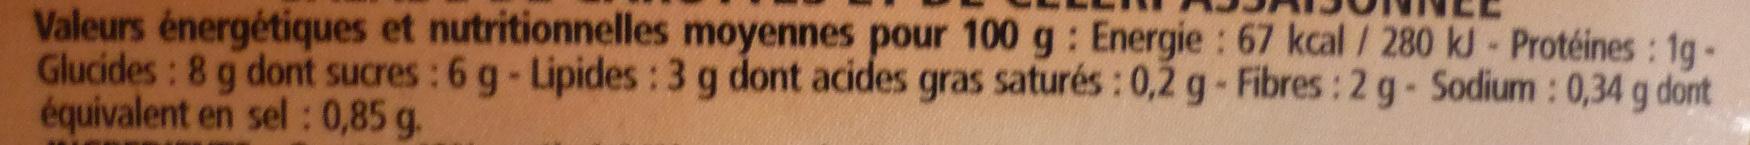 Duo carottes et céleri - Voedingswaarden - fr